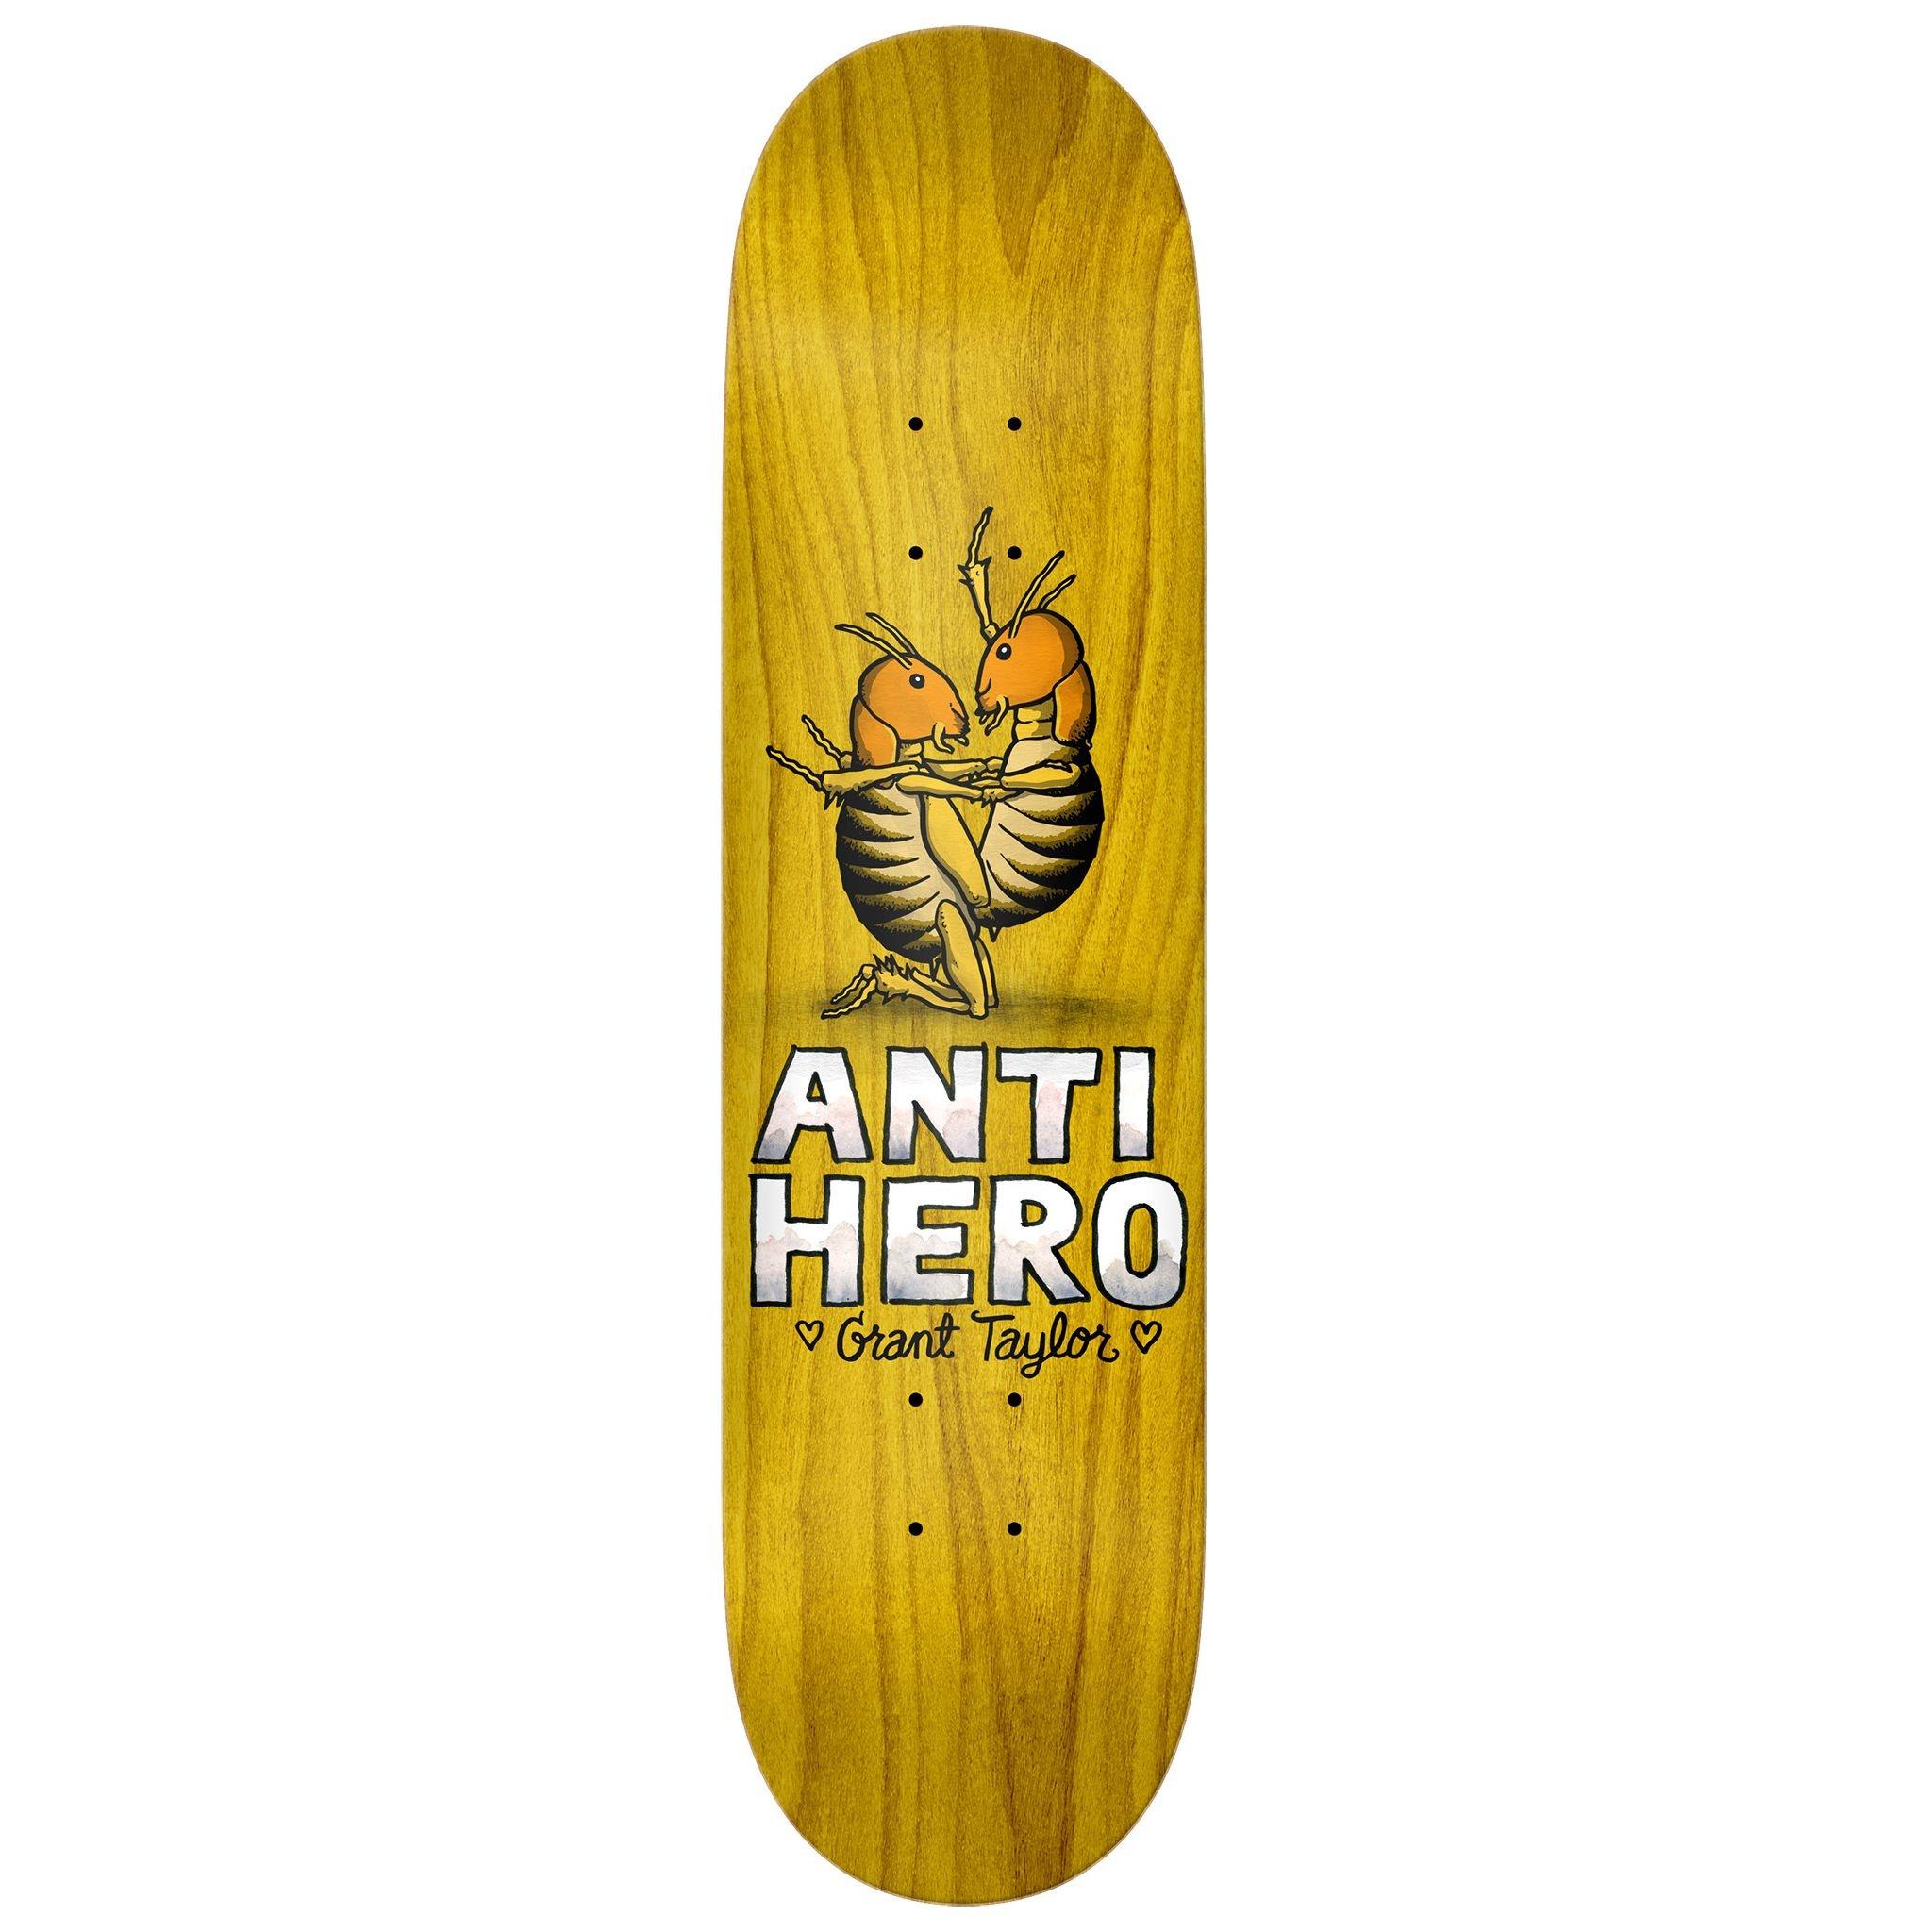 ANTIHERO ANTI HERO GRANT FOR LOVERS 8.4